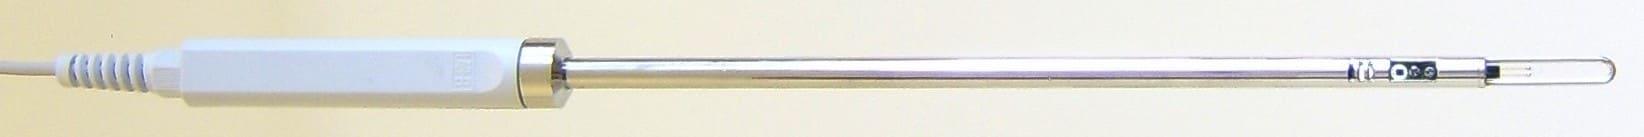 LB-584 thermo-hygro-anemometer